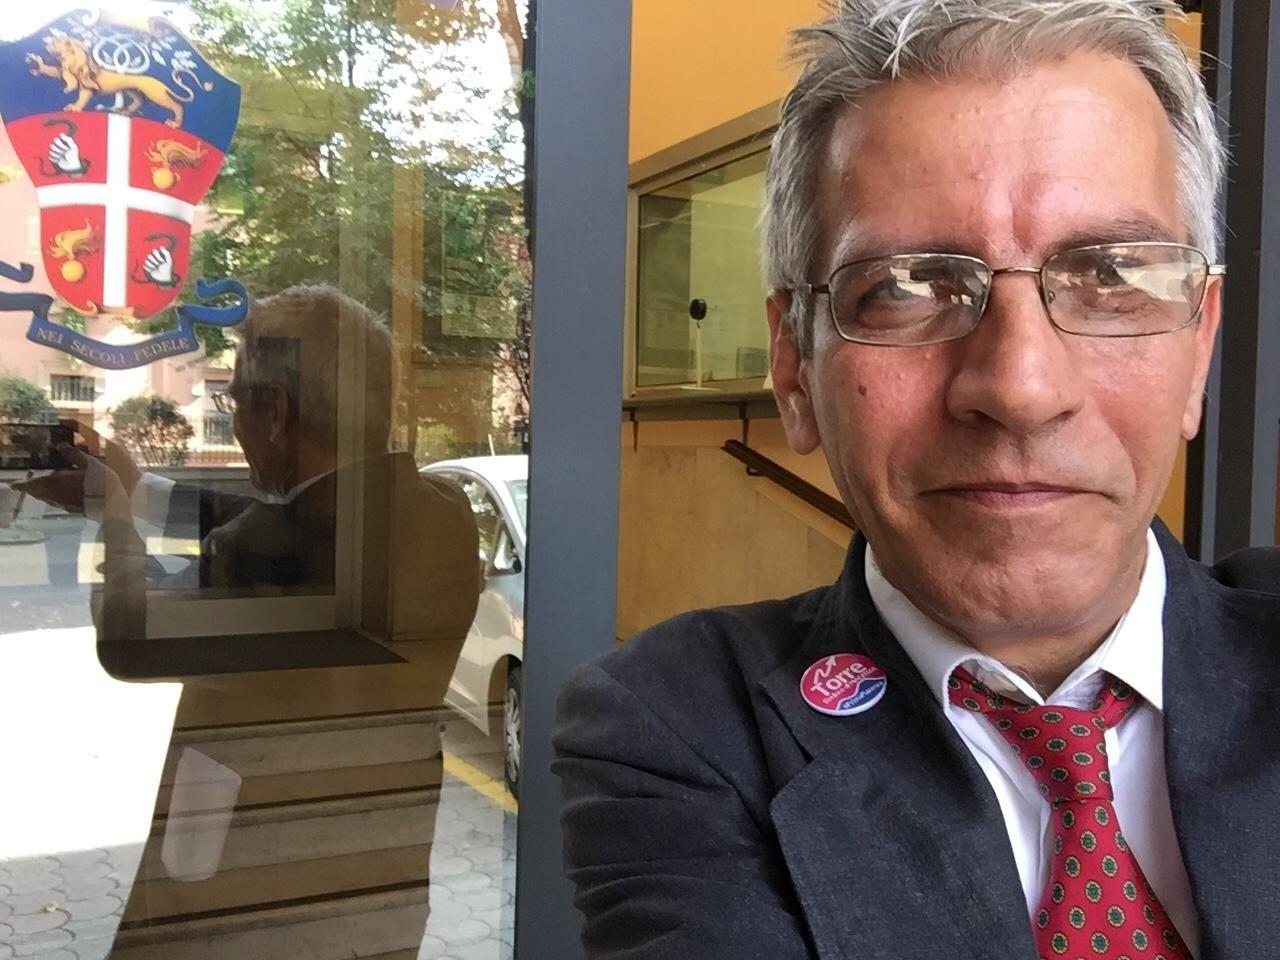 gioco di riflessi in un selfie di Torre davanti alla caserma dei Carabinieri